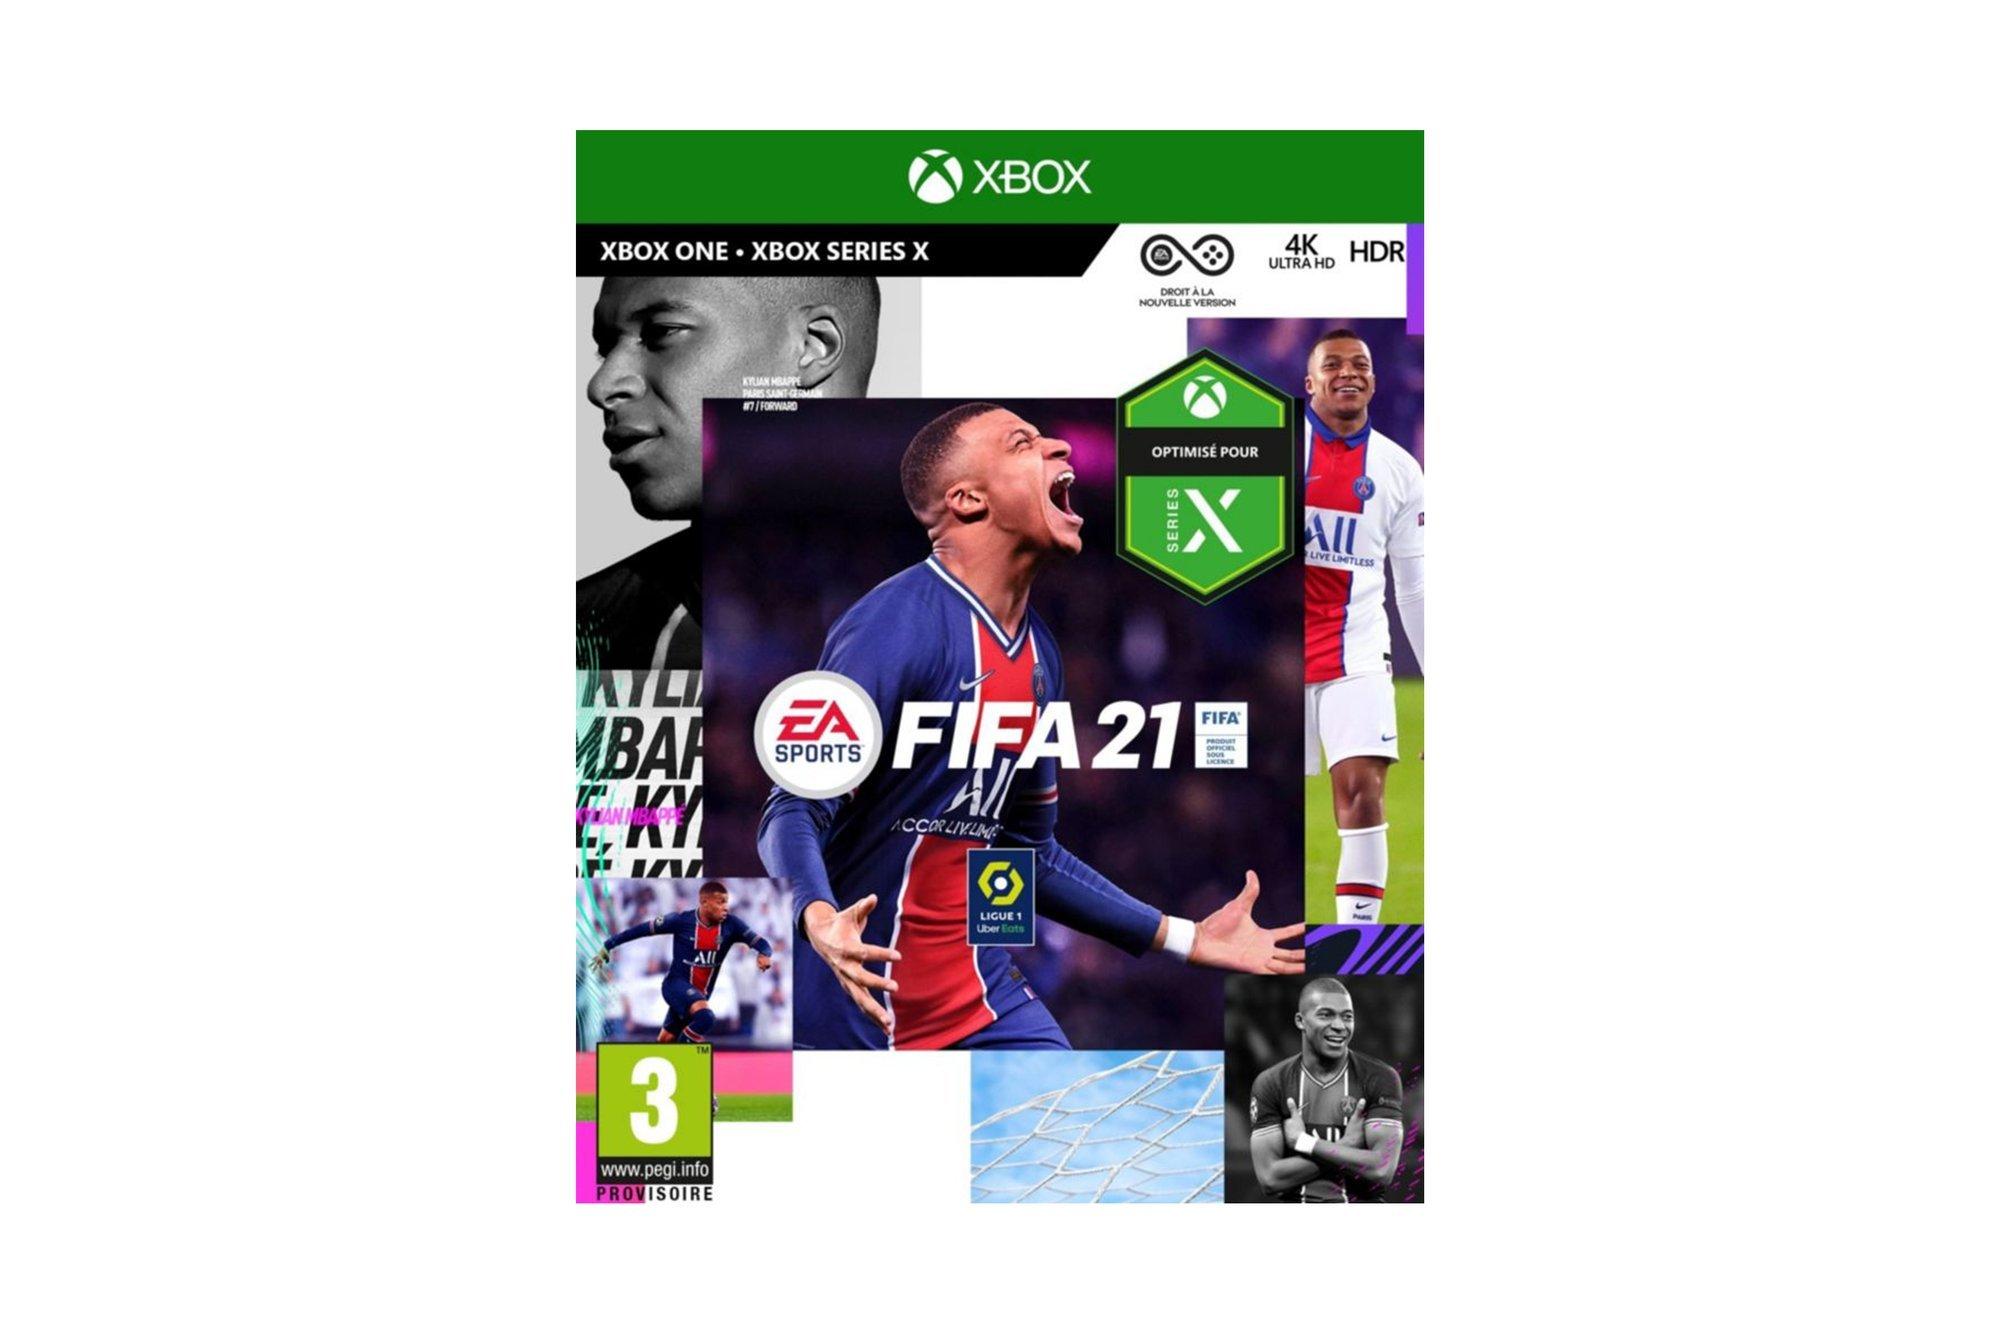 New EA FIFA 21 - Xbox One / Series X - FIFA 2021 Box